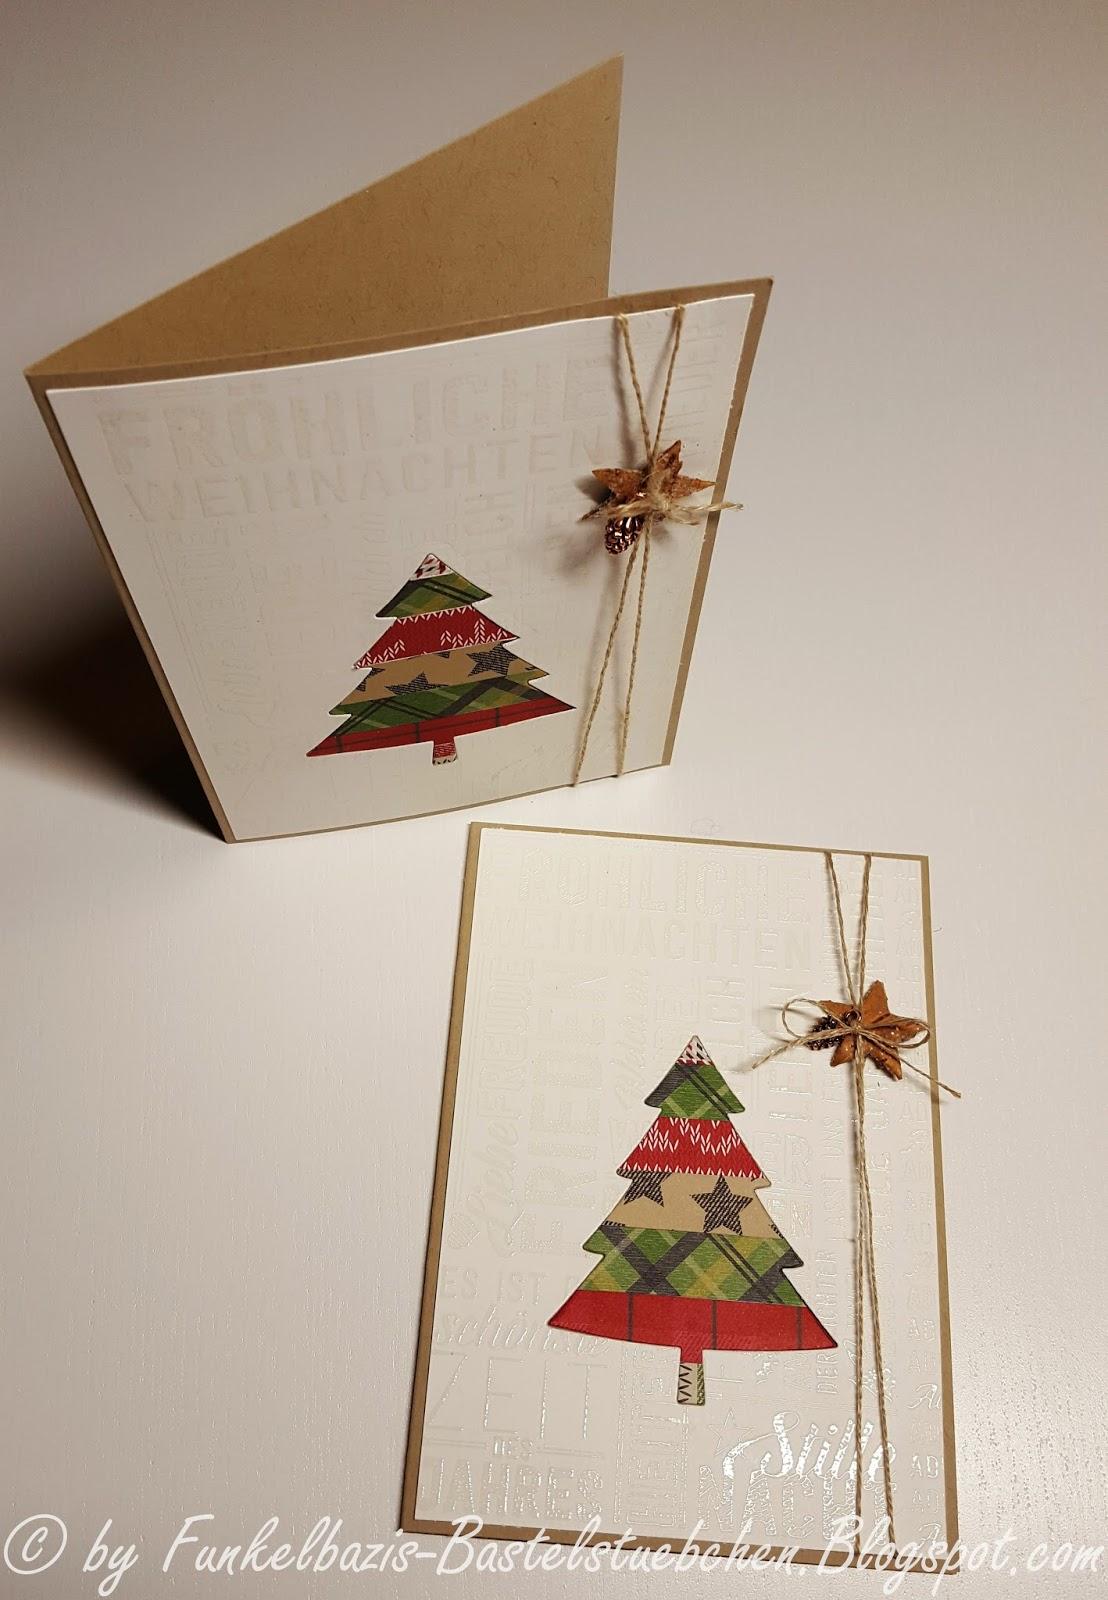 Edle Weihnachtskarten.Funkelbazis Bastelstubchen Schlichte Edle Weihnachtskarten